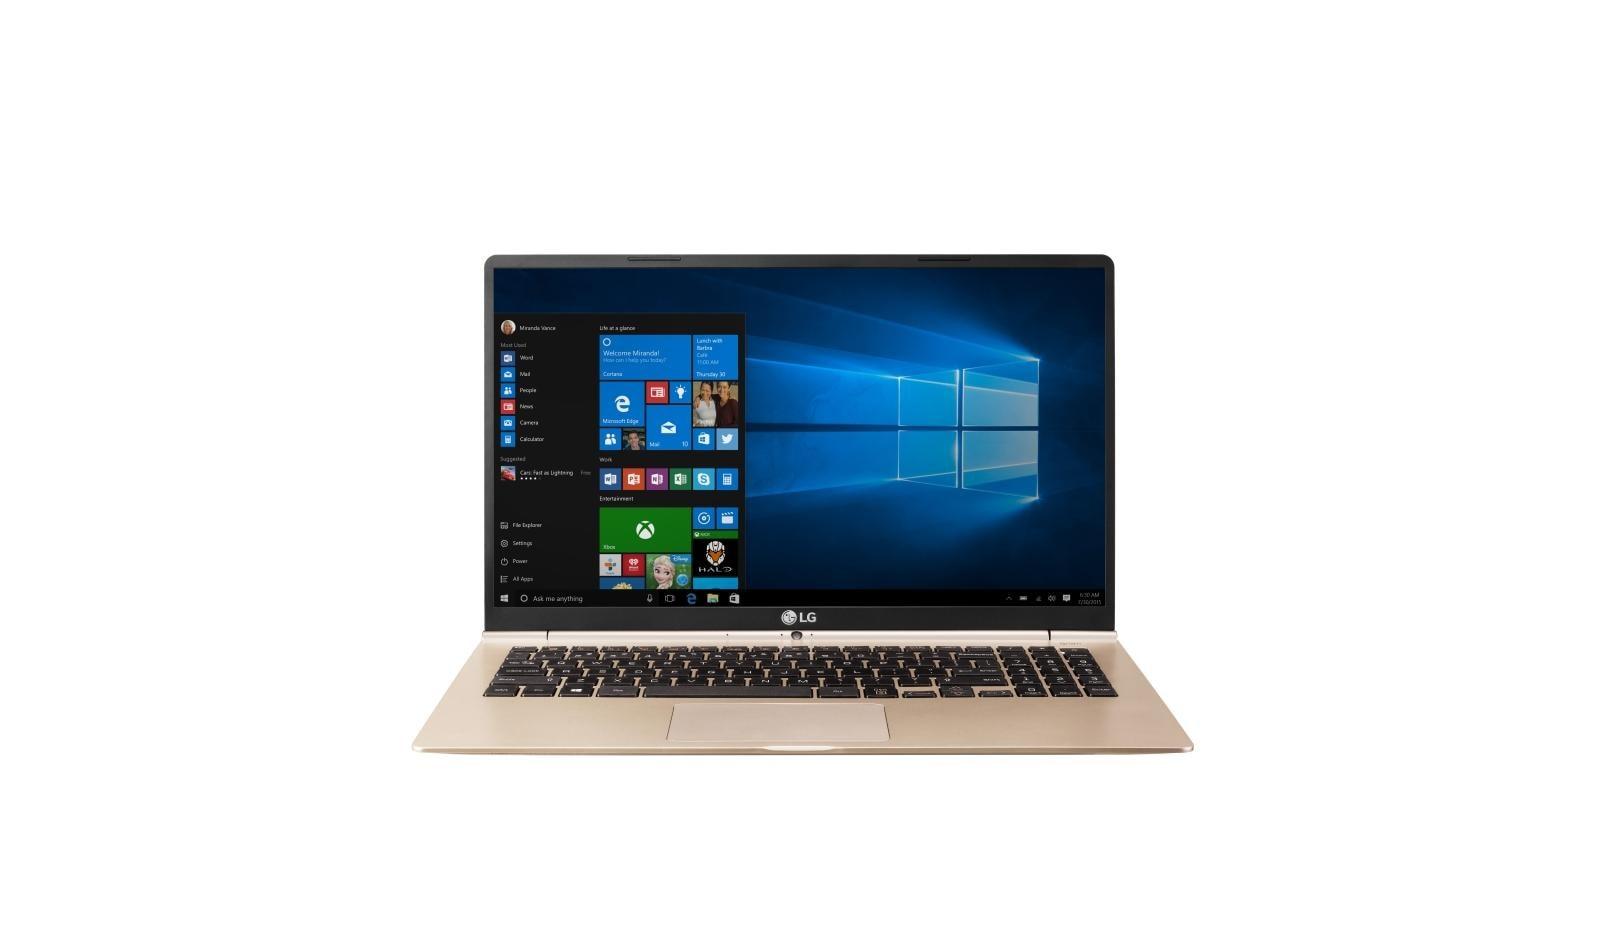 Lg 15z960 Aaa75u1 Gram 15 Core I7 Processor Ultra Slim Laptop Diagram Of Internal Computer Parts 2016 Usa